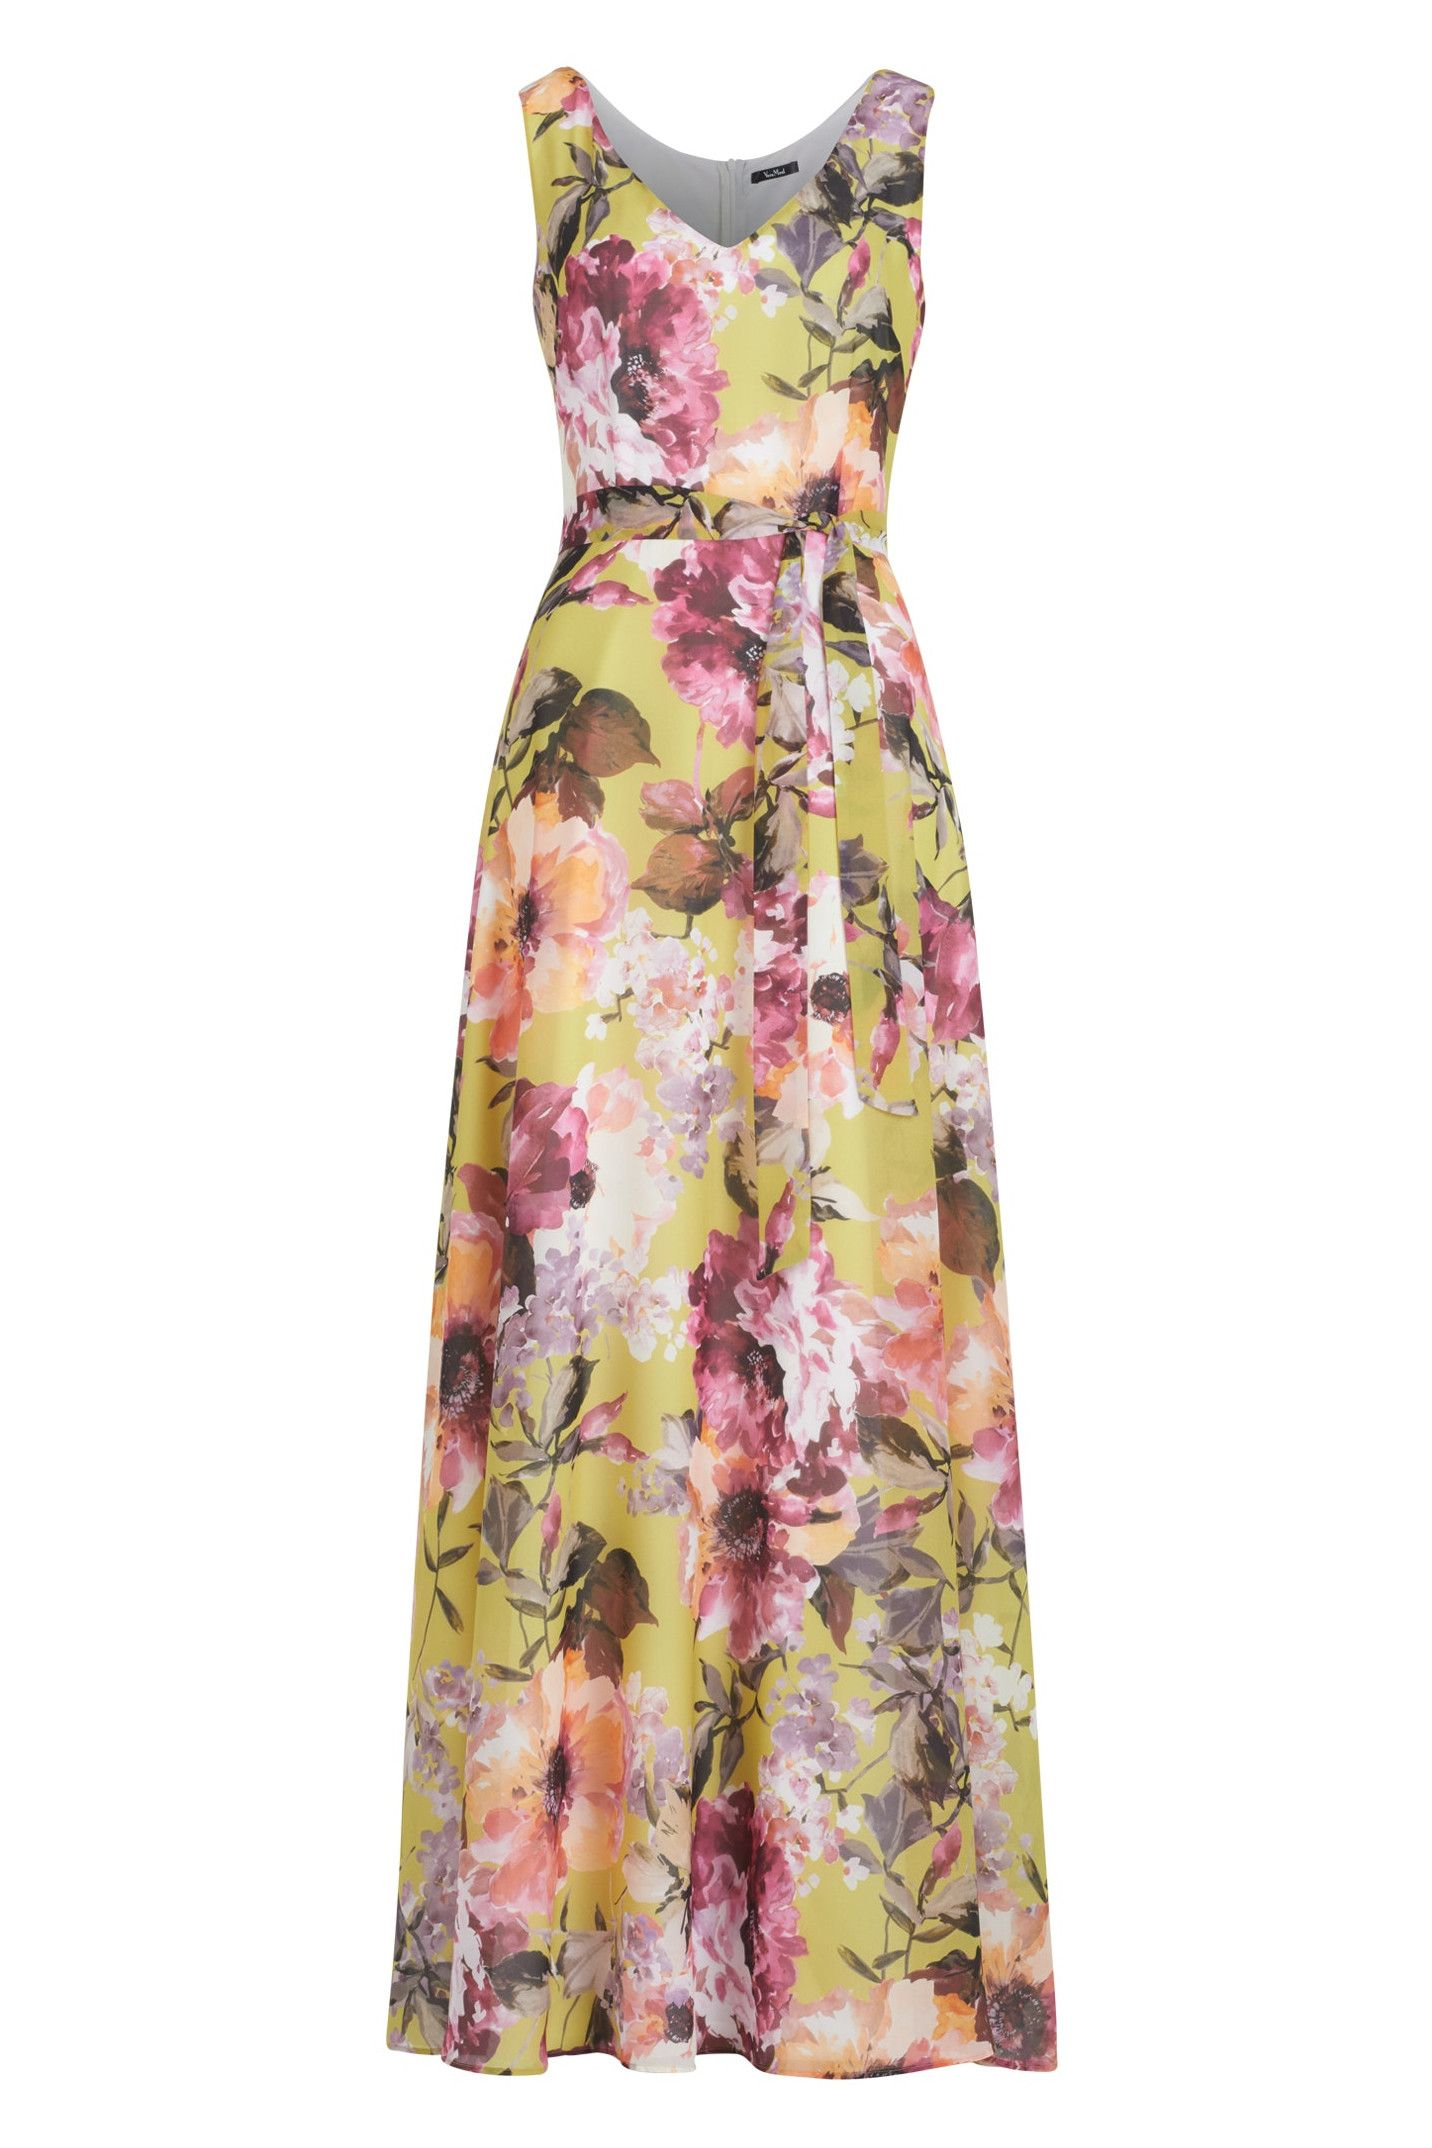 Langes Kleid mit Blütenprint  Sommerkleid, Kleider, Modestil